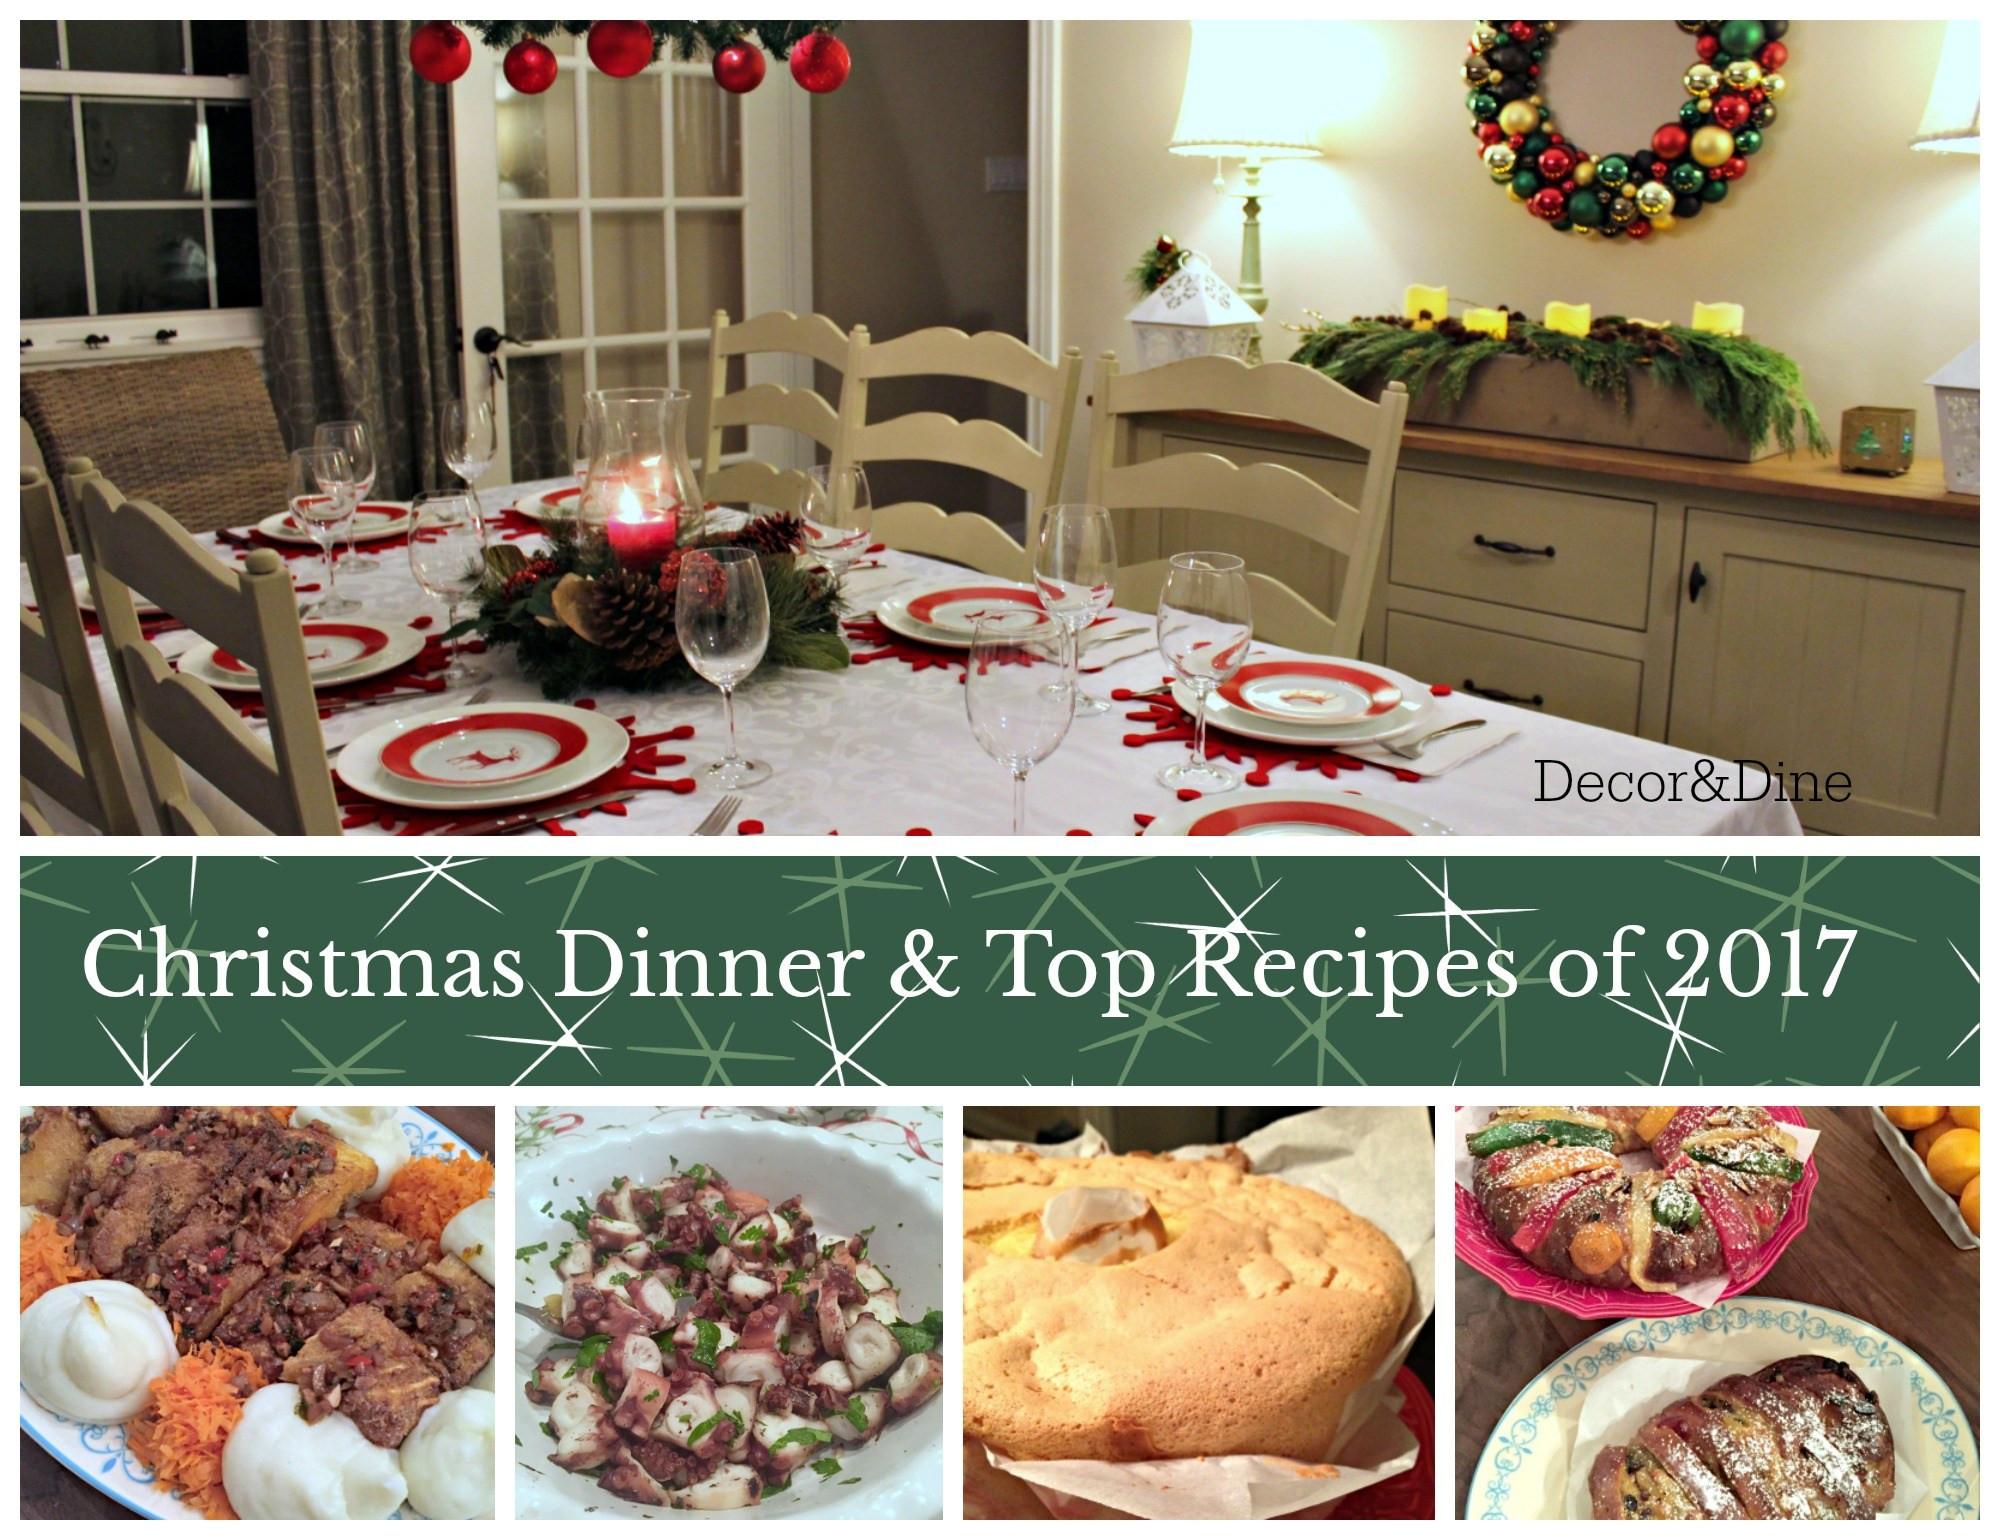 Christmas Dinner Ideas 2017  Christmas Dinner & the Top 3 Recipes of 2017